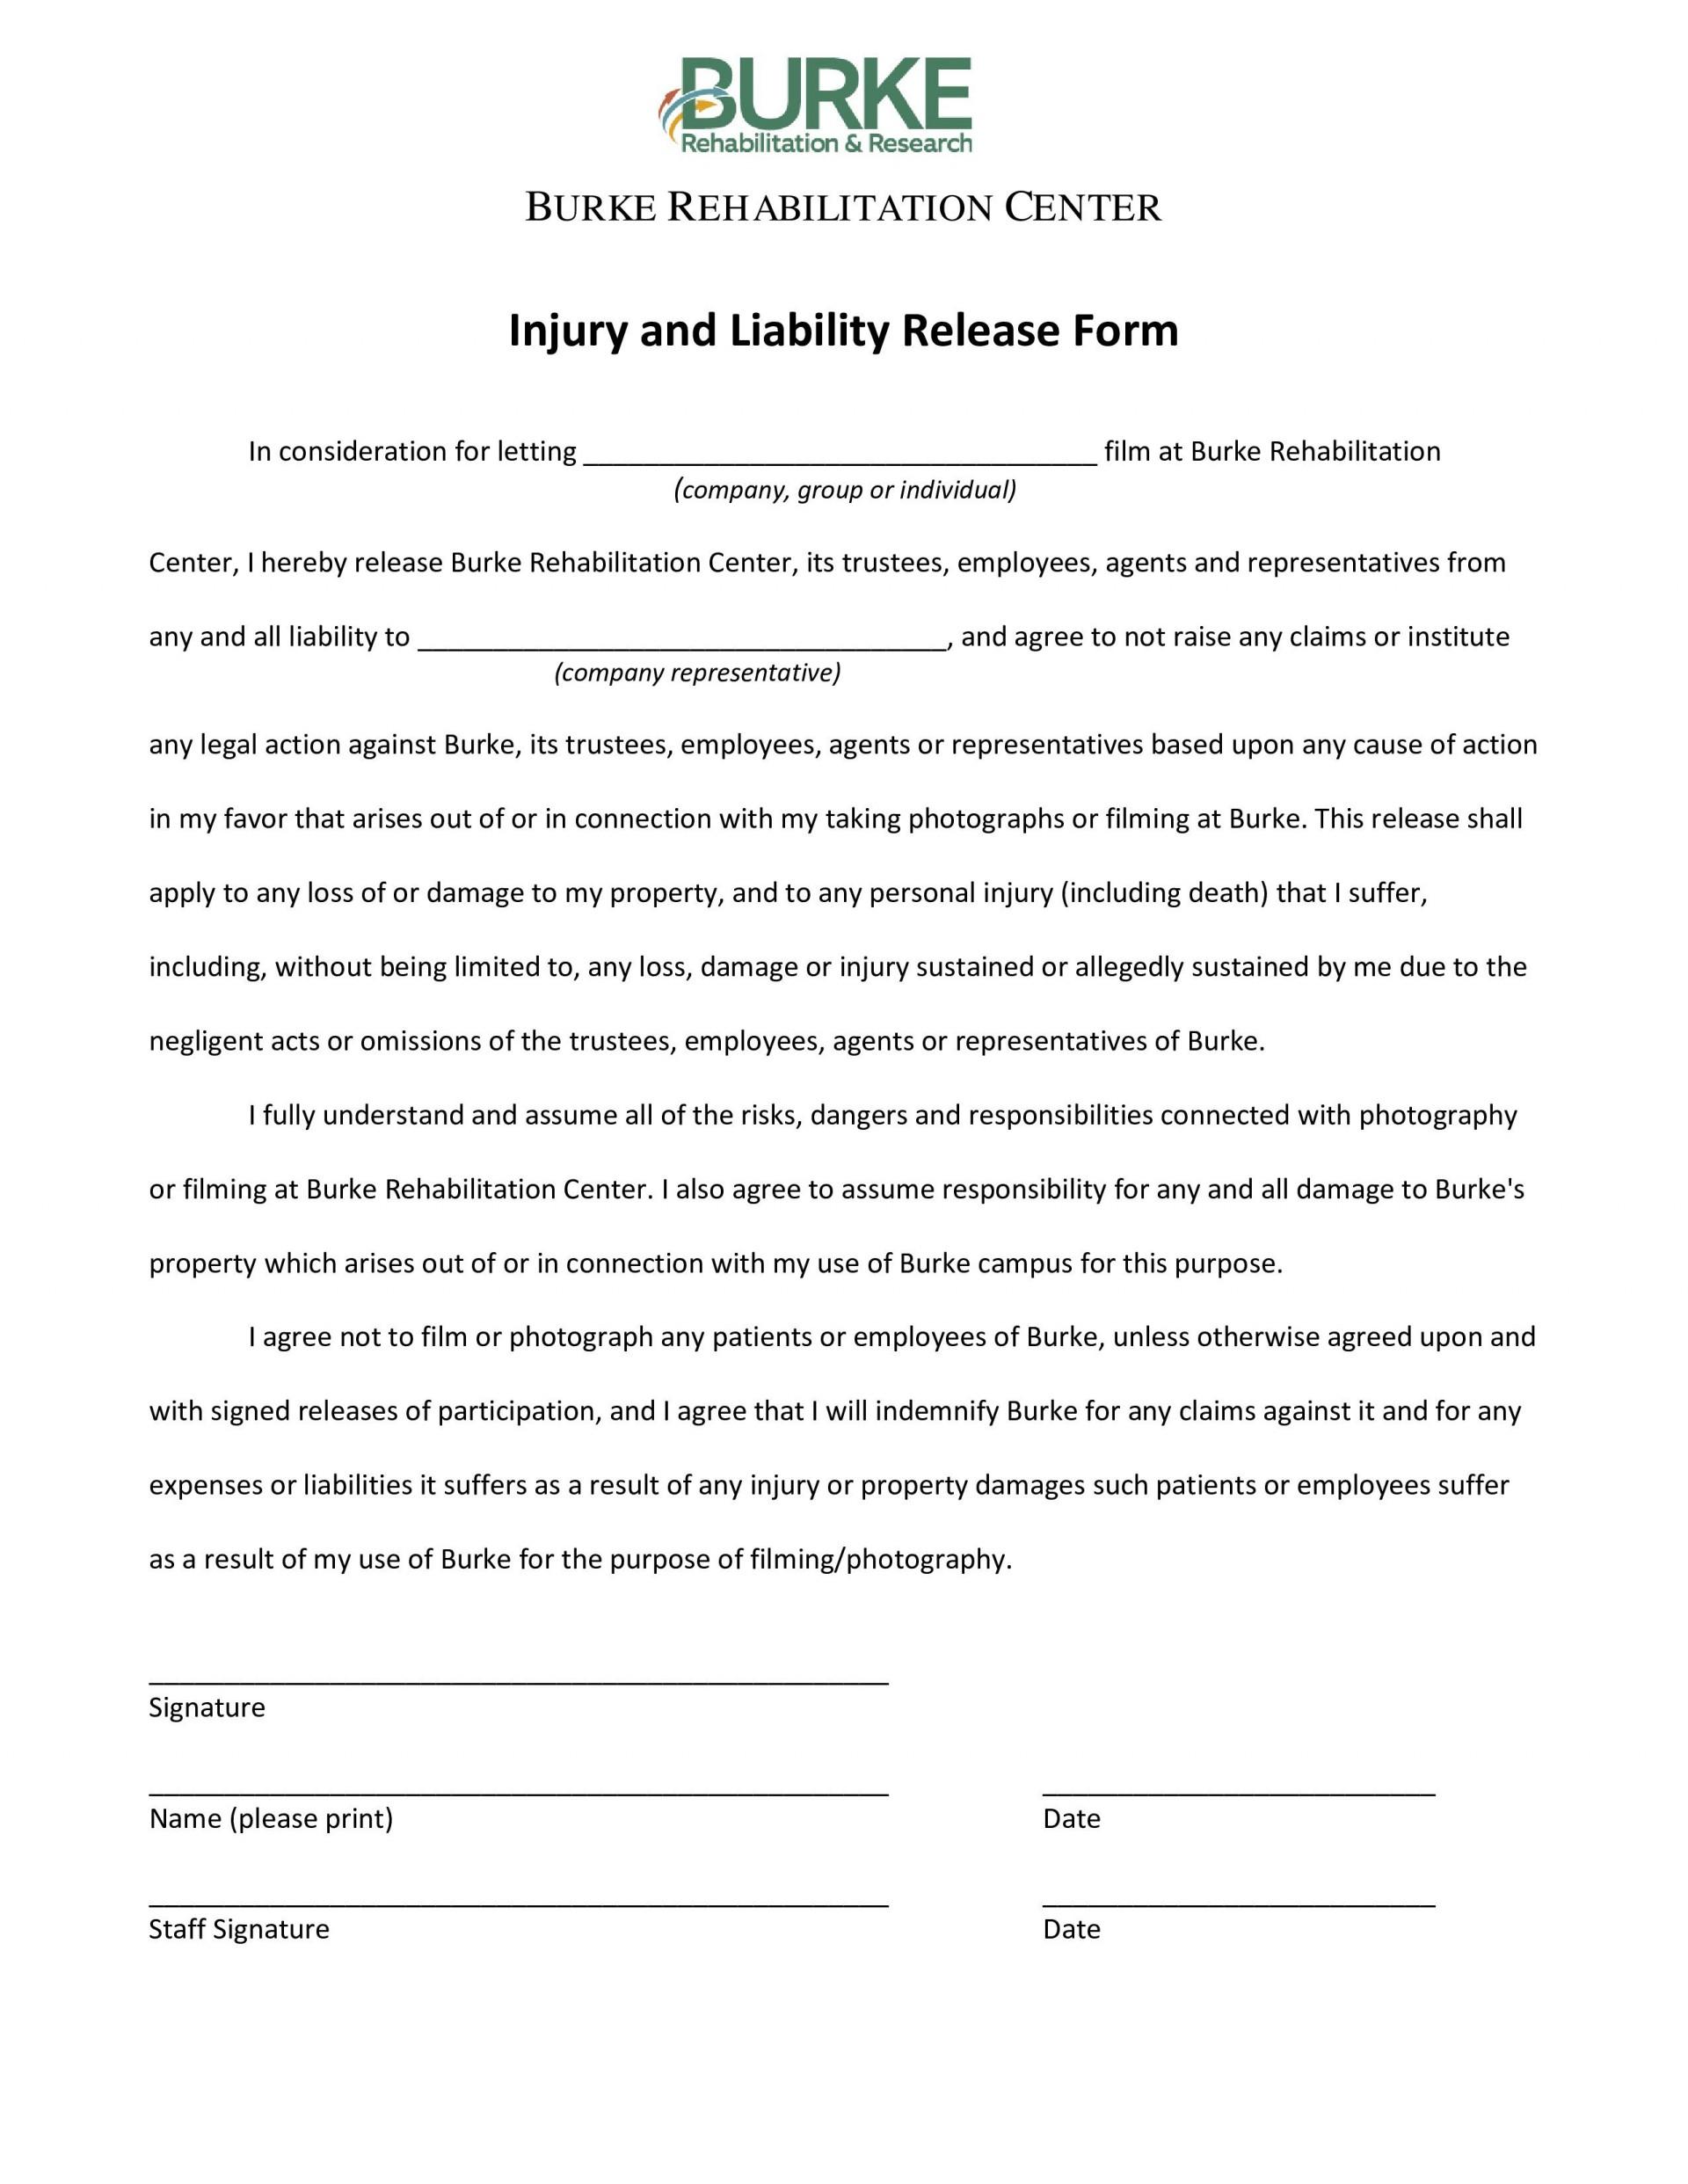 007 Breathtaking Liability Release Form Template Idea  Free General1920